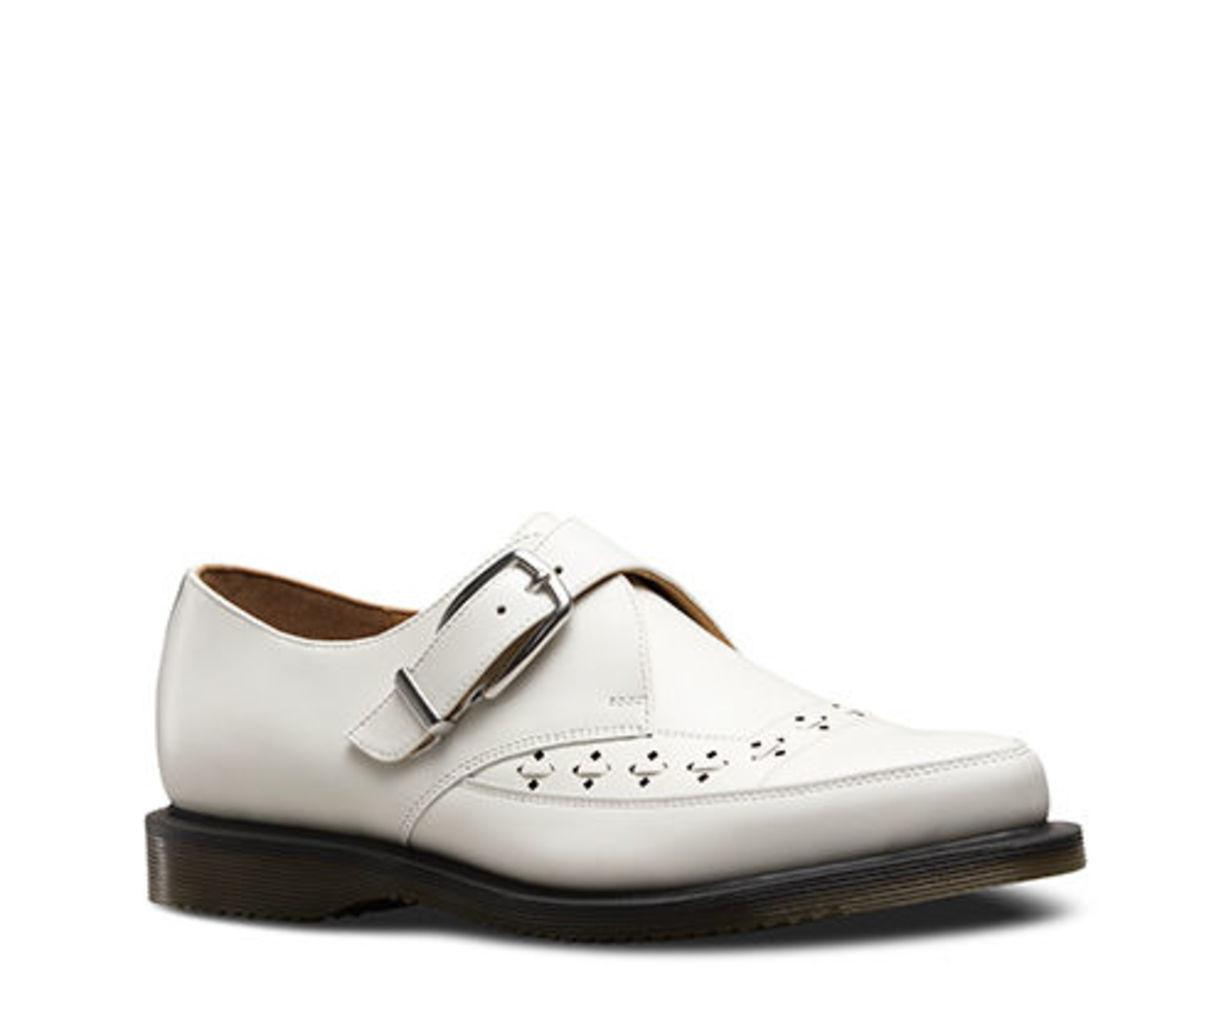 Rousden Shoe